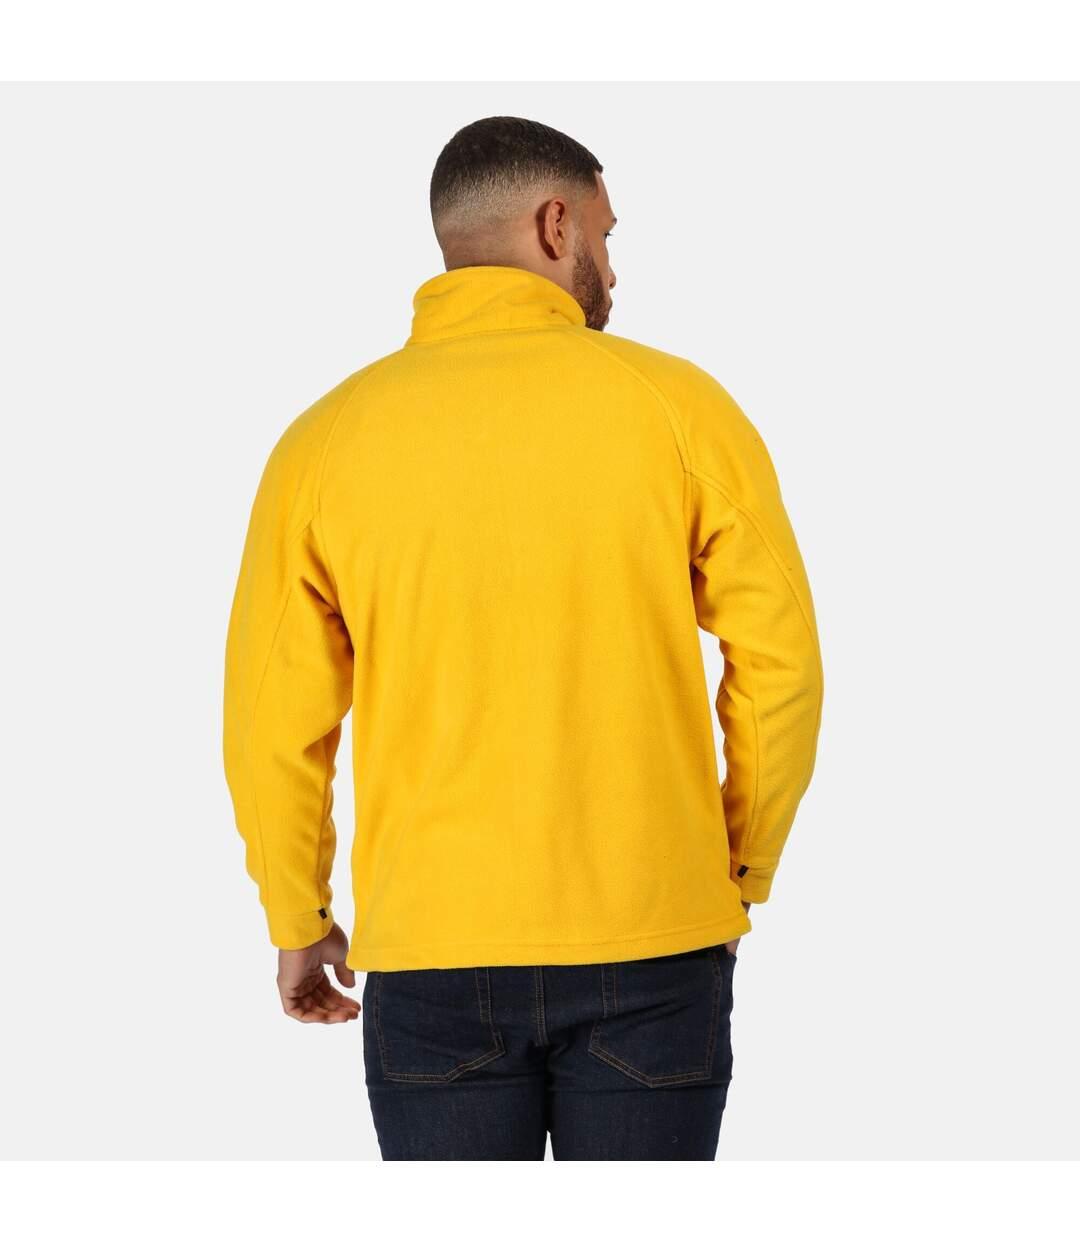 Regatta Mens Thor III Anti-Pill Fleece Jacket (Classic Red) - UTRW1198